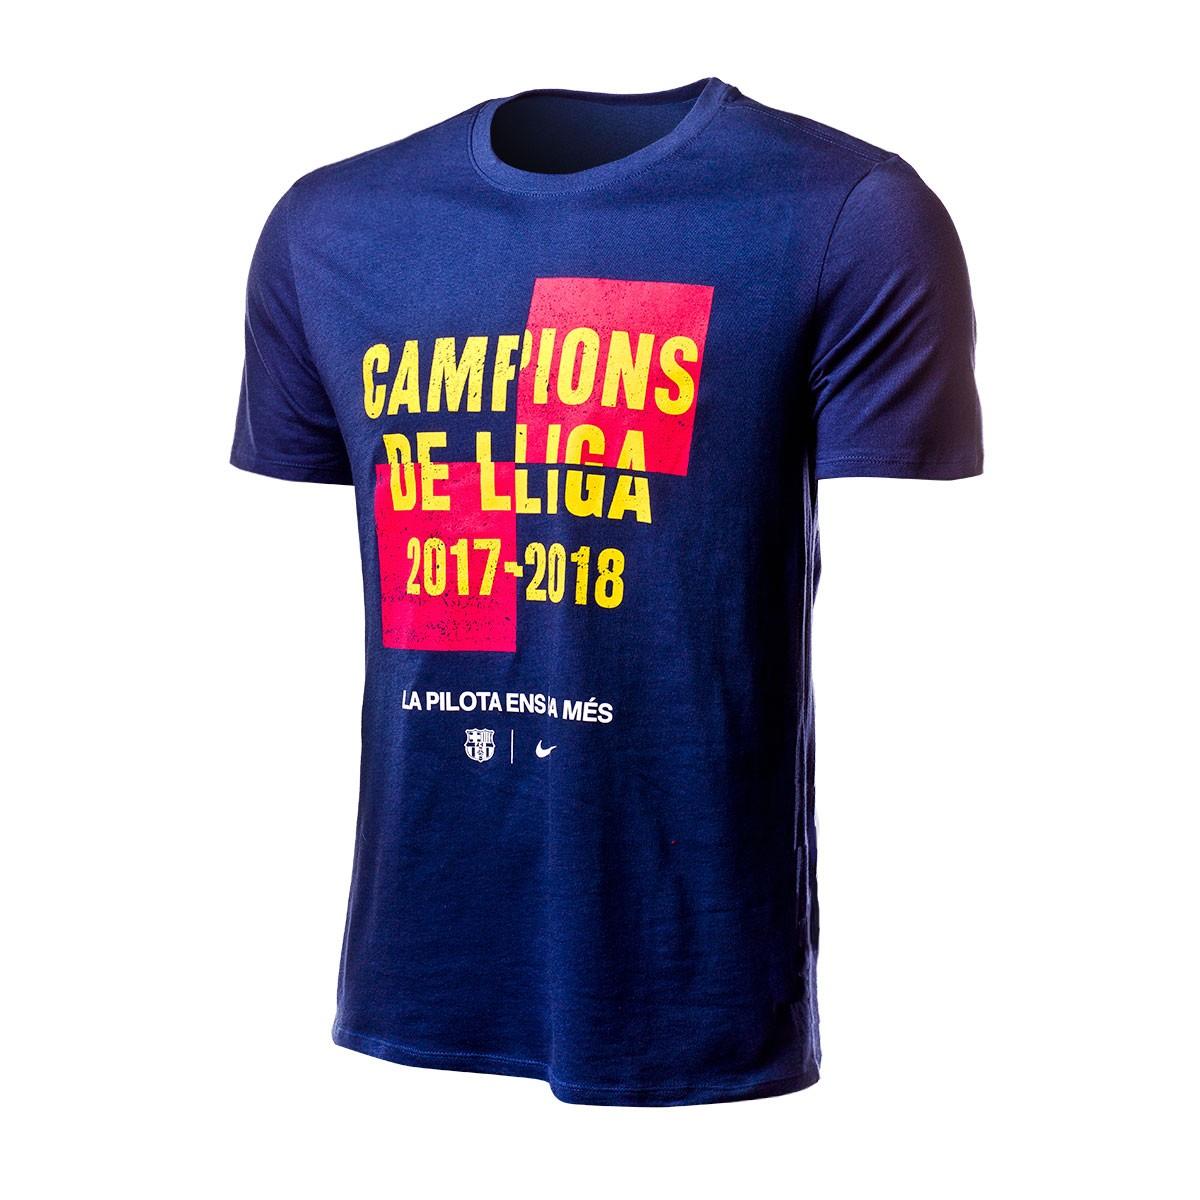 5ae16e96b2e46 Camiseta Nike FC Barcelona Campeón de Liga 2017-2018 Midnight navy - Tienda  de fútbol Fútbol Emotion